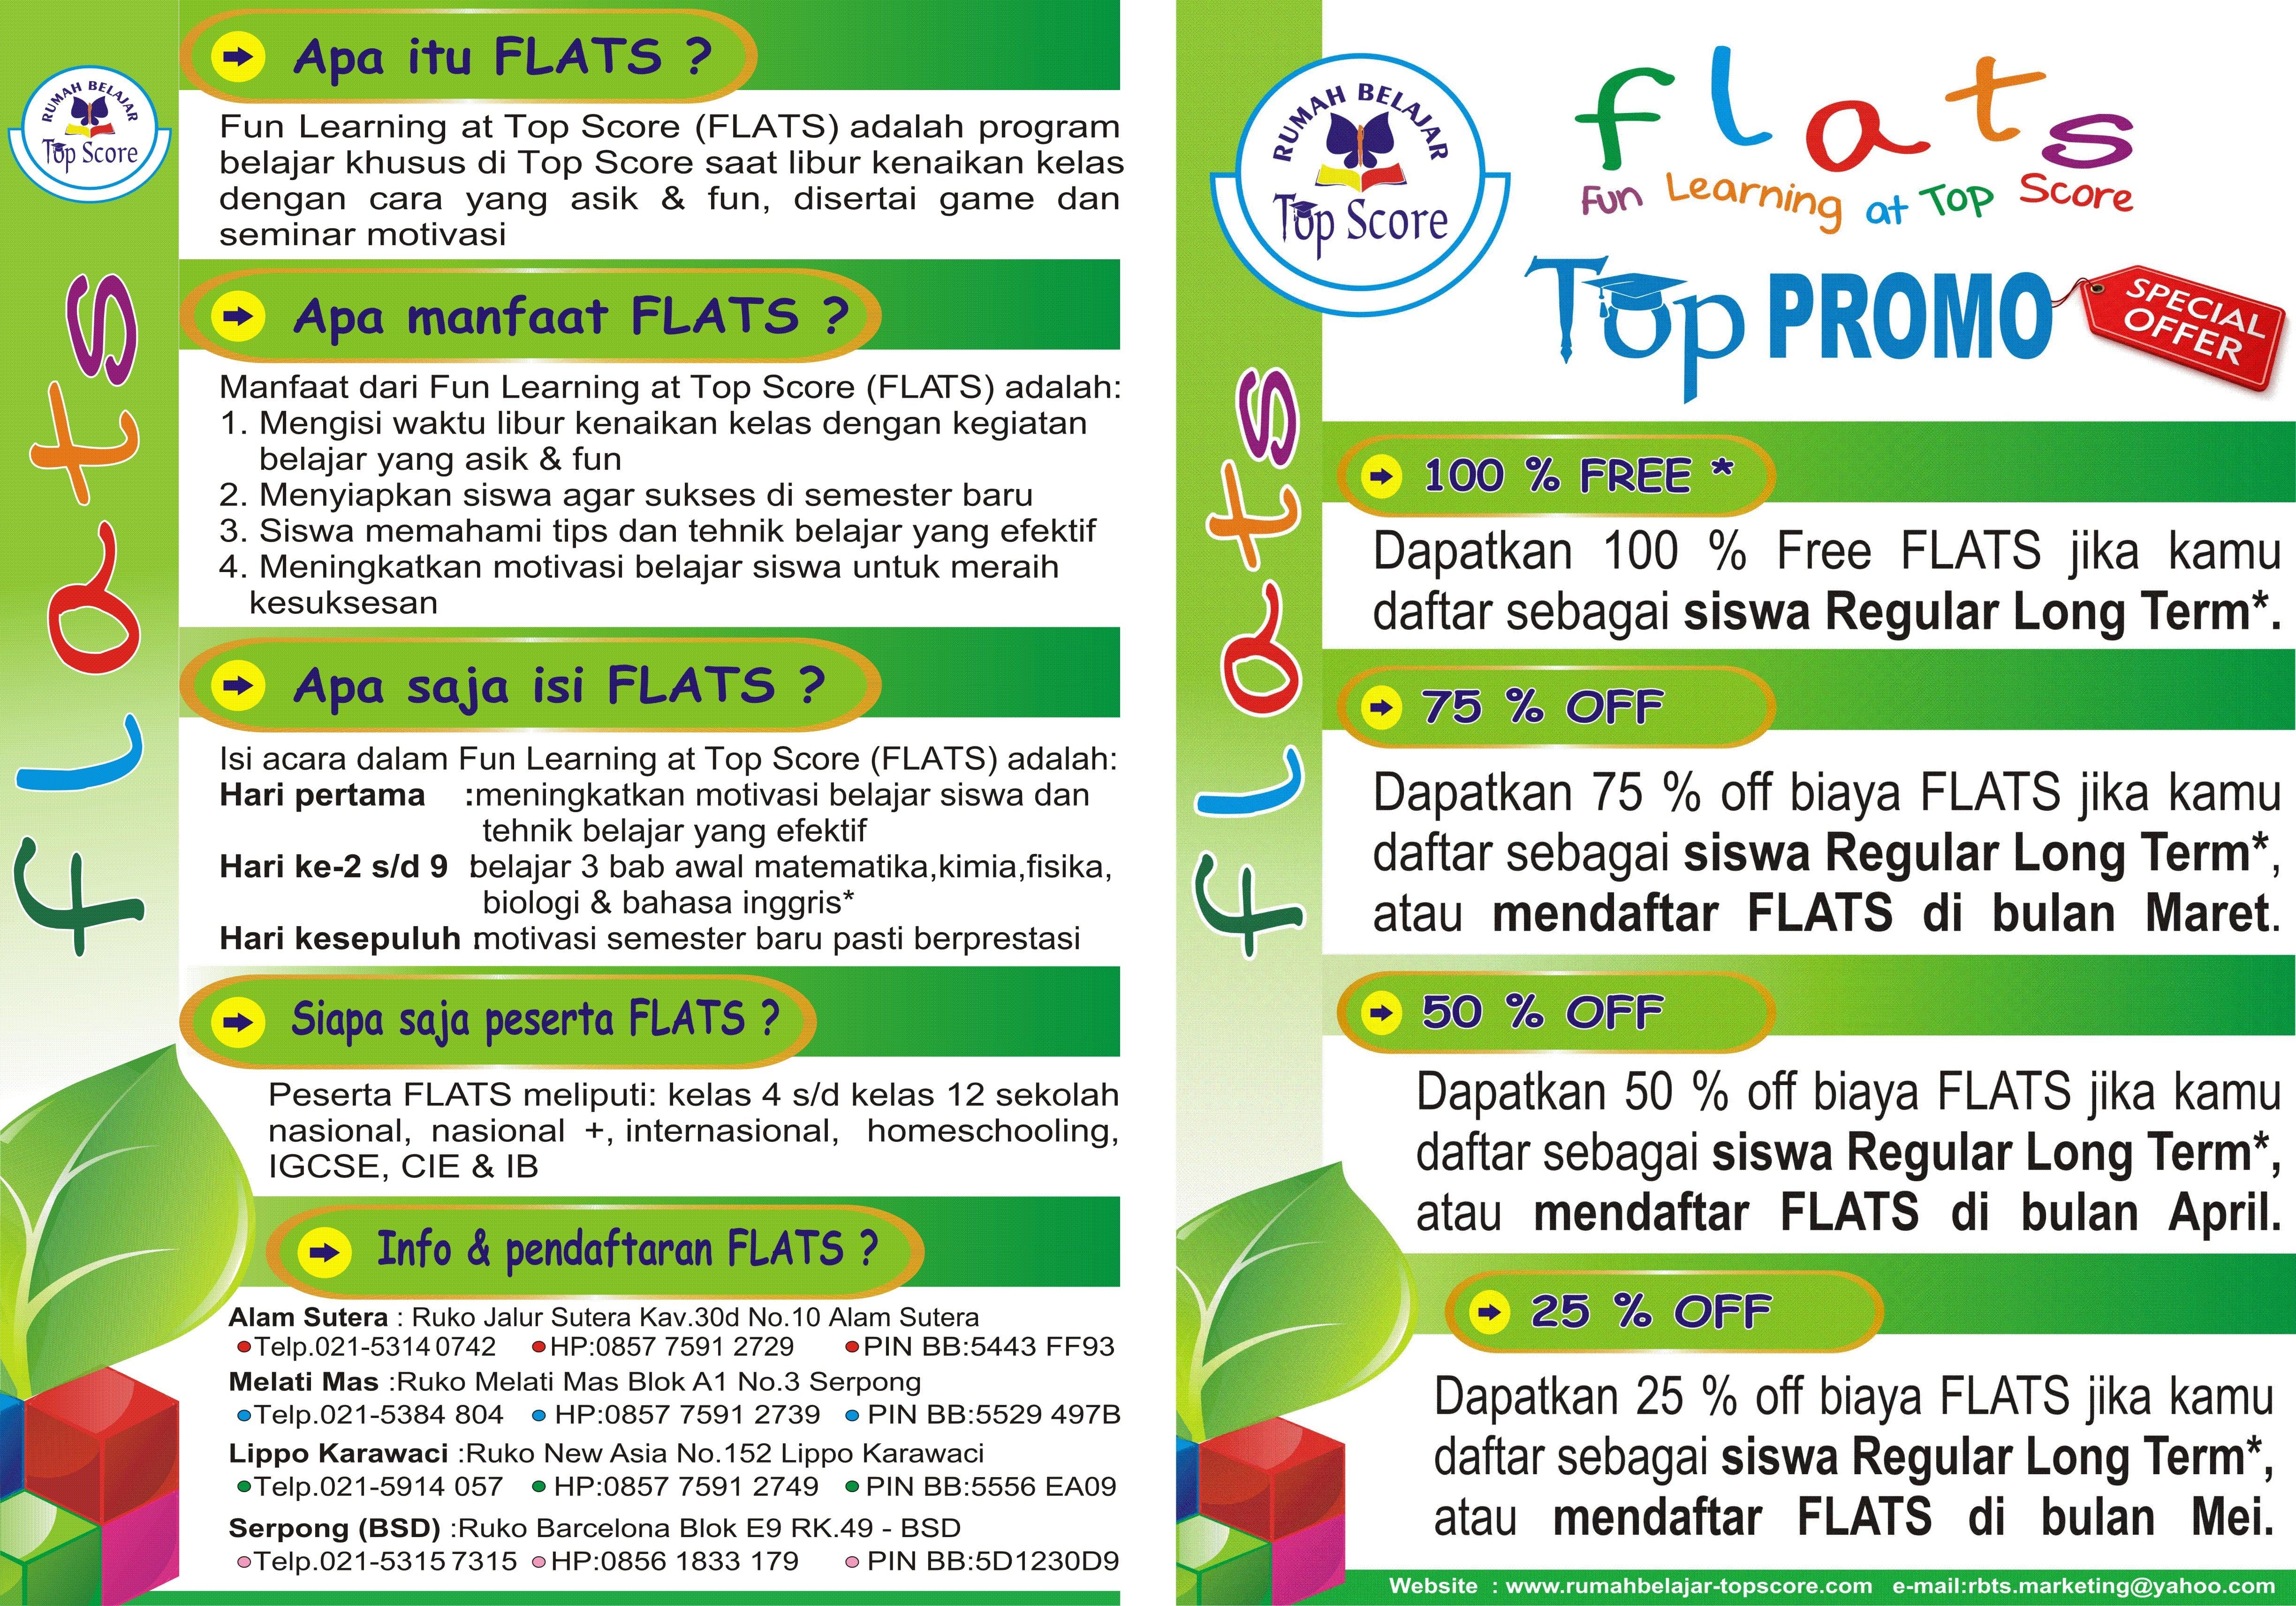 info flats 2016 all cabang